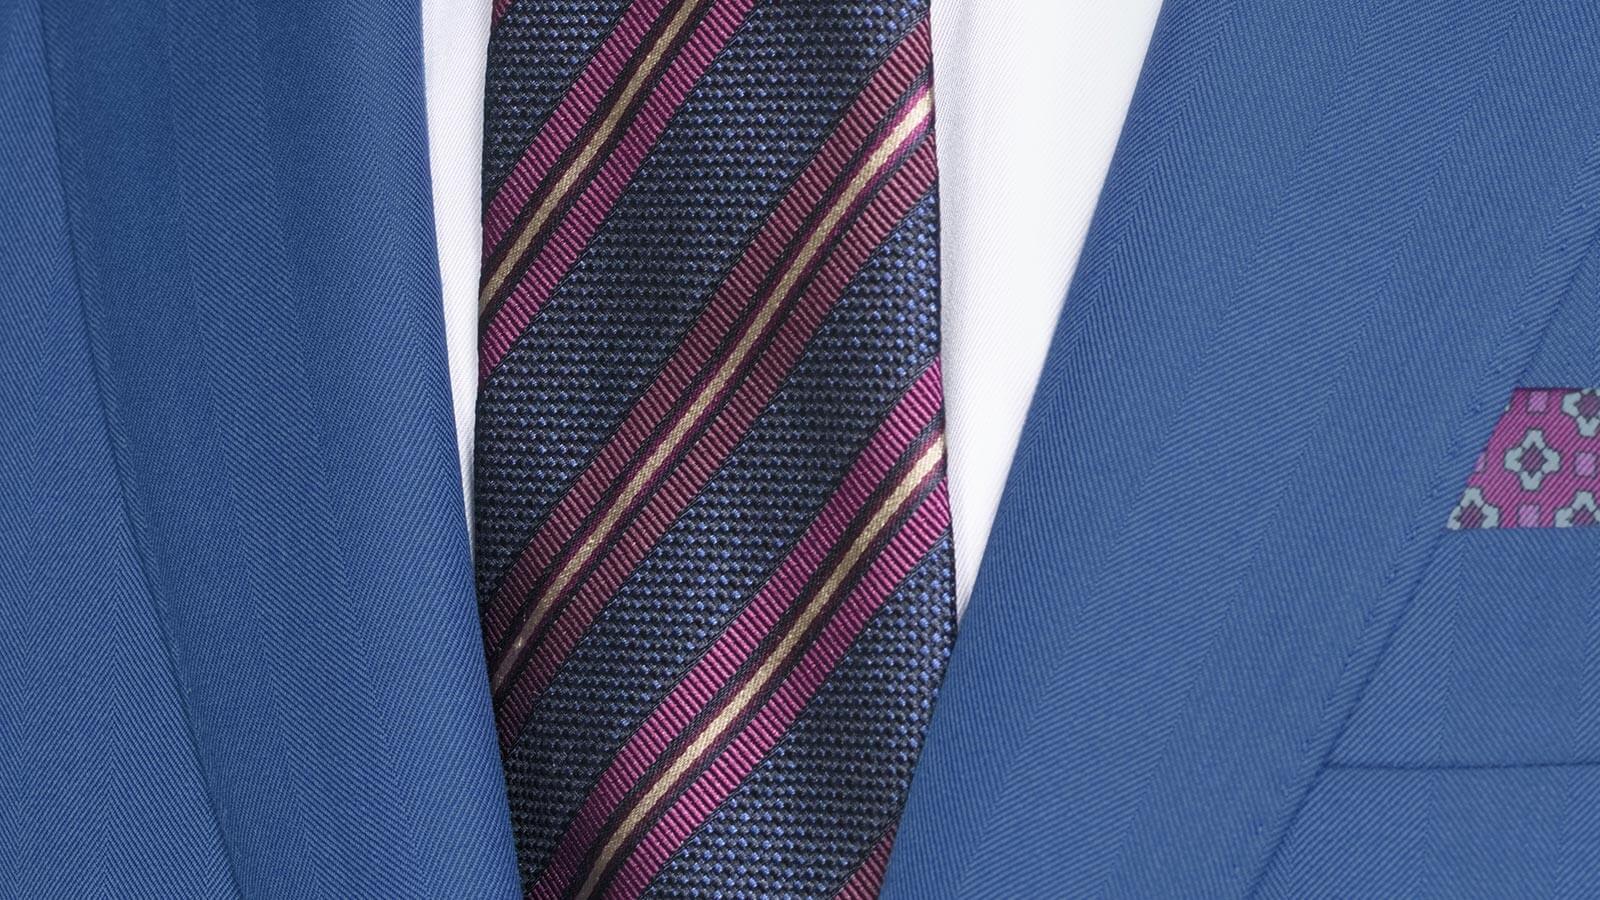 Sartorial Intense Blue Herringbone 160s Suit - slider image 1